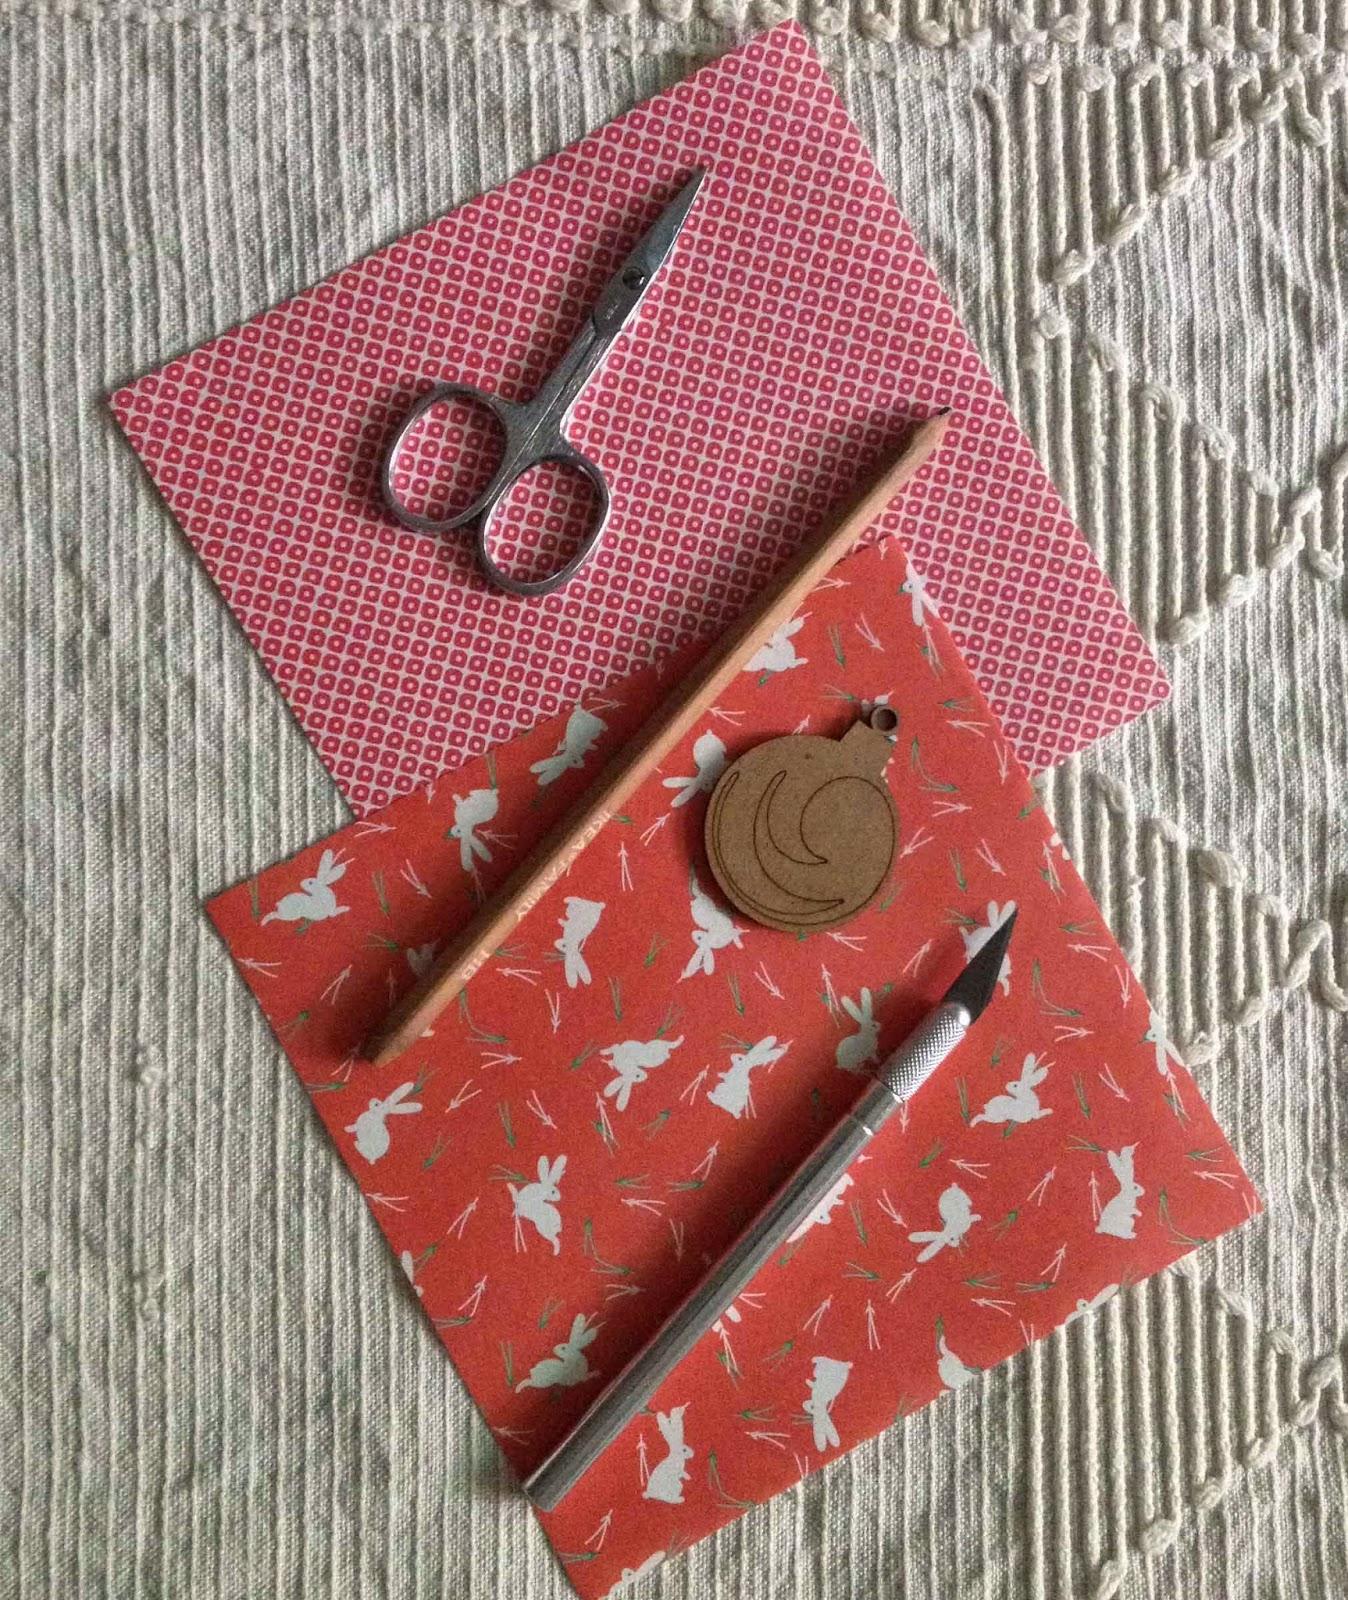 Uzuki adornos navide os y papel origami for Adornos navidenos origami paso a paso